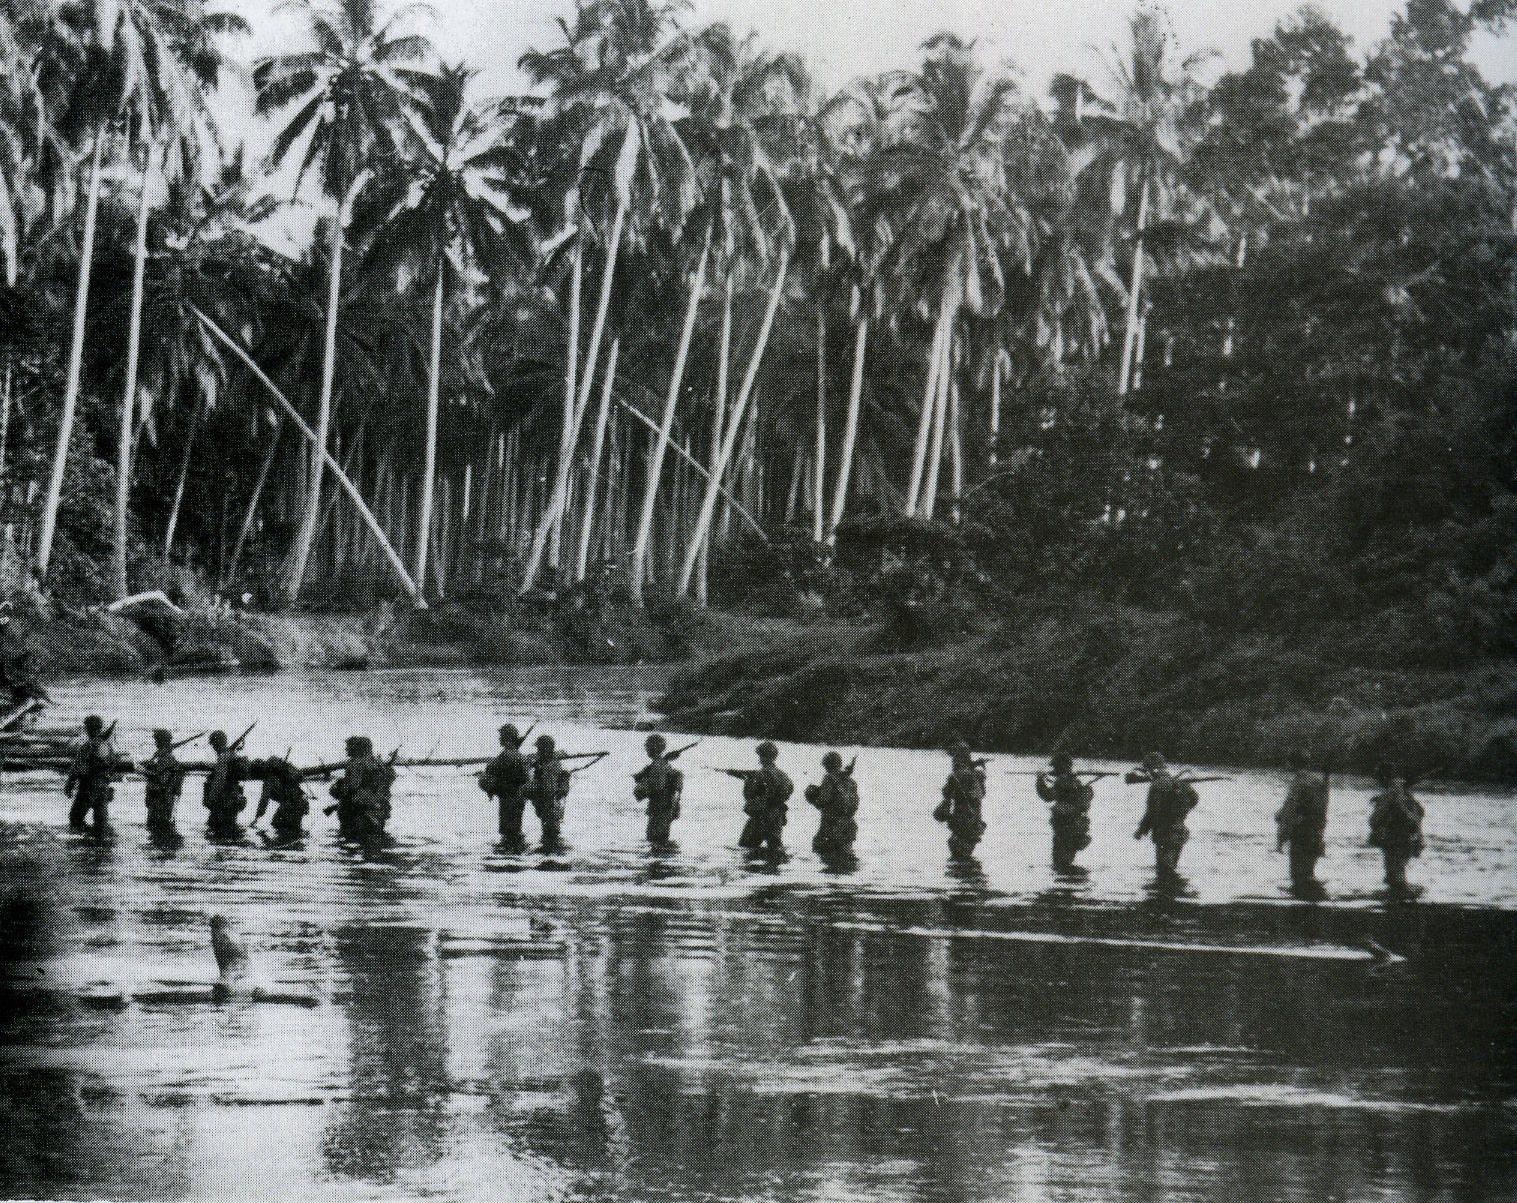 A U.S. Marine patrol crosses the Matanikau River on Guadalcanal in September 1942.